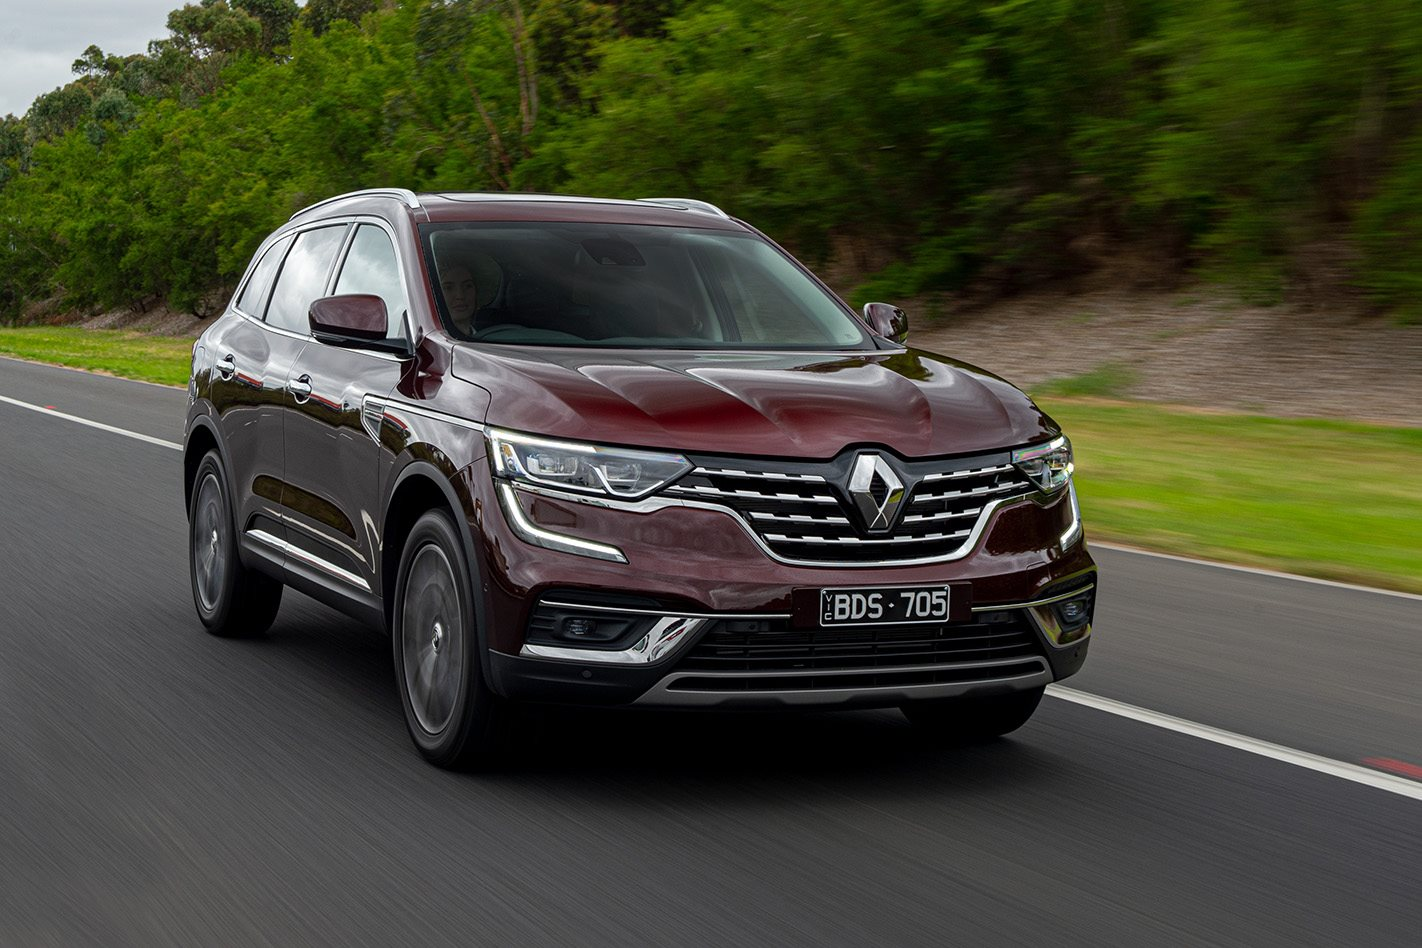 Renault Koleos 2020 Review Price Features